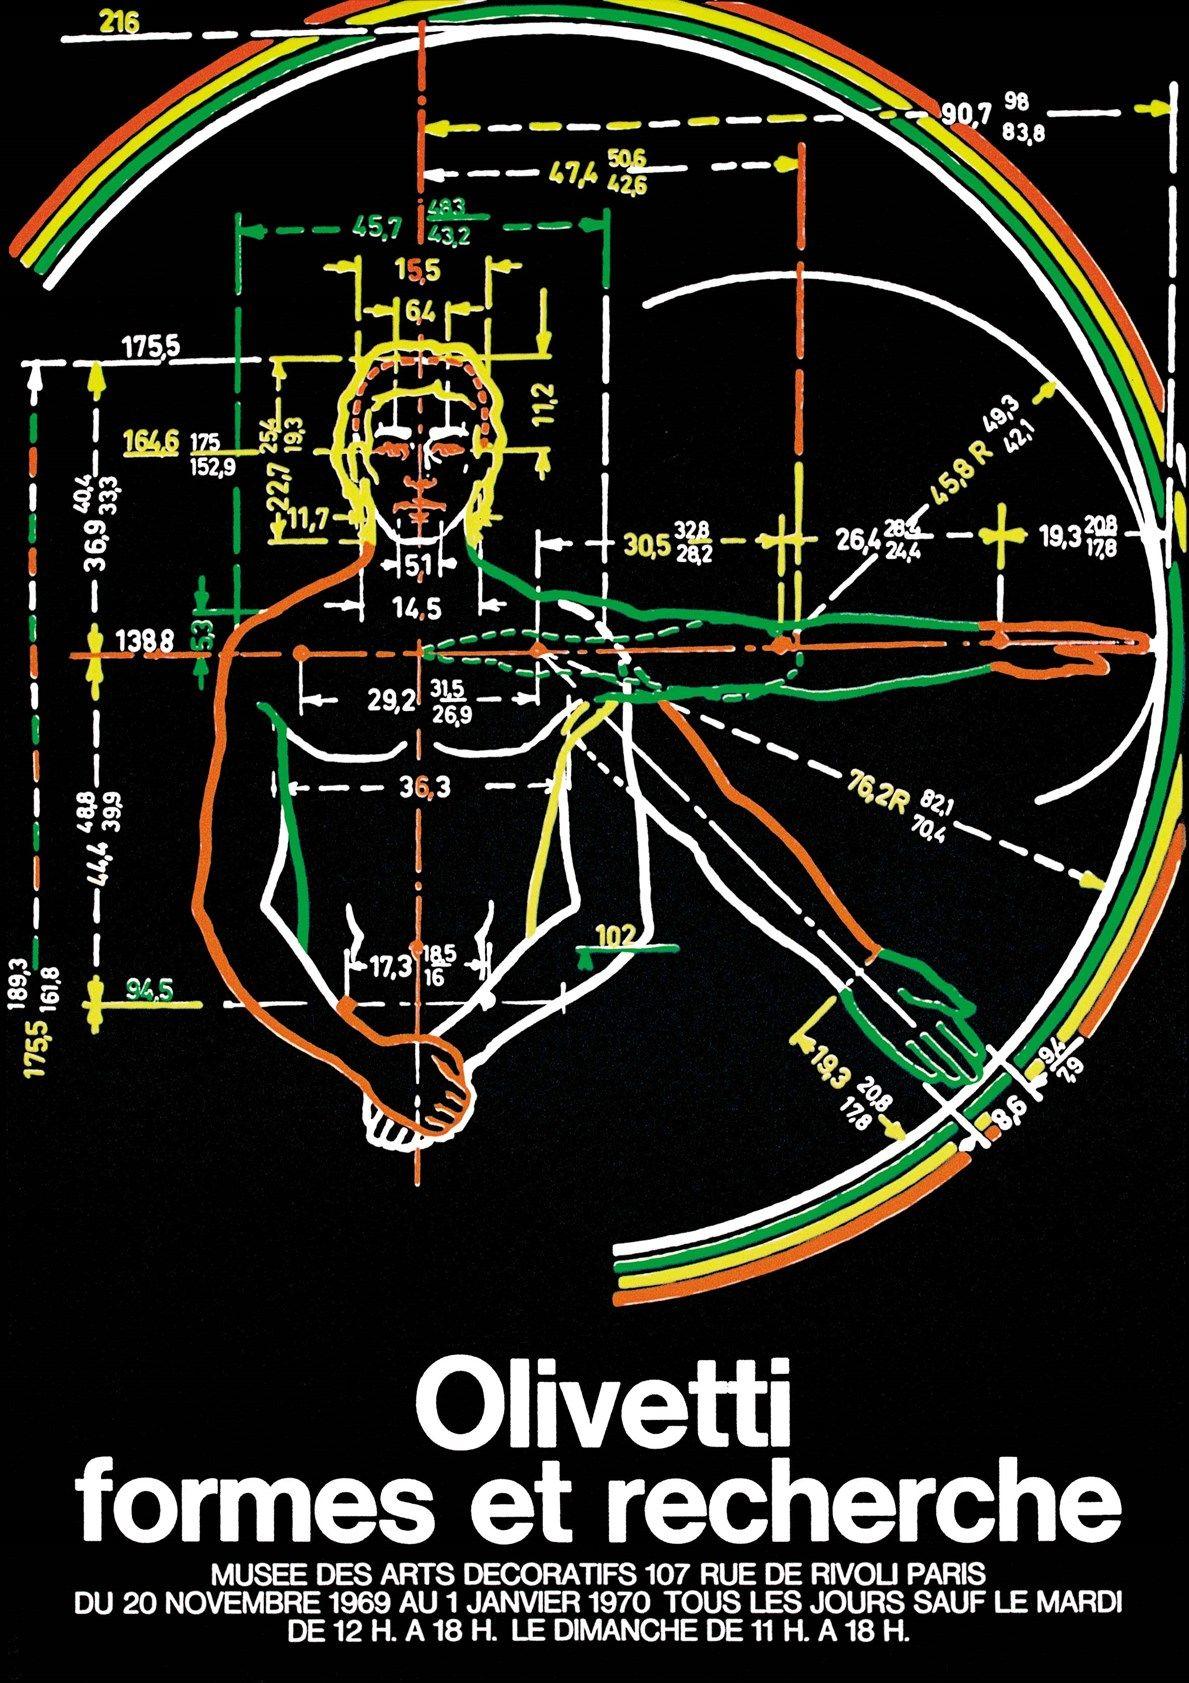 C.T. Castelli e R. Pieracini (Studio Sottsass jr.), manifesto della mostra Olivetti formes et recherche, Parigi, Musée des Arts Décoratifs, 1969